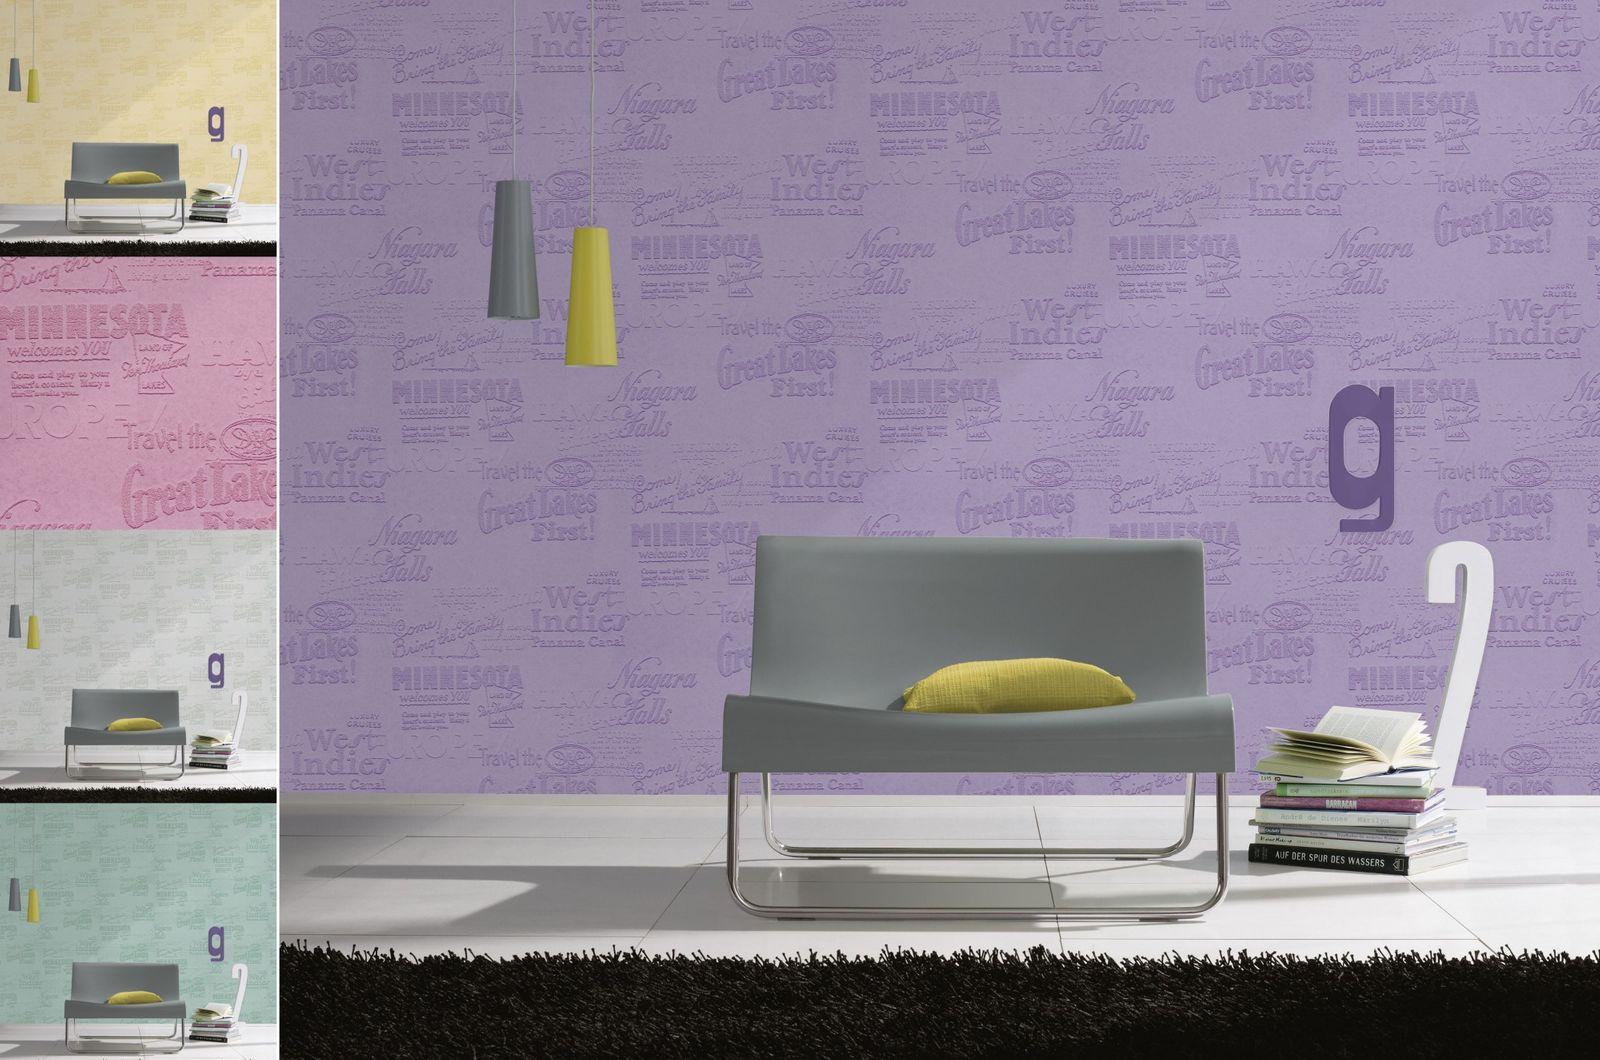 vliestapete berstreichbar vintage wei patent decor 3d 9463. Black Bedroom Furniture Sets. Home Design Ideas